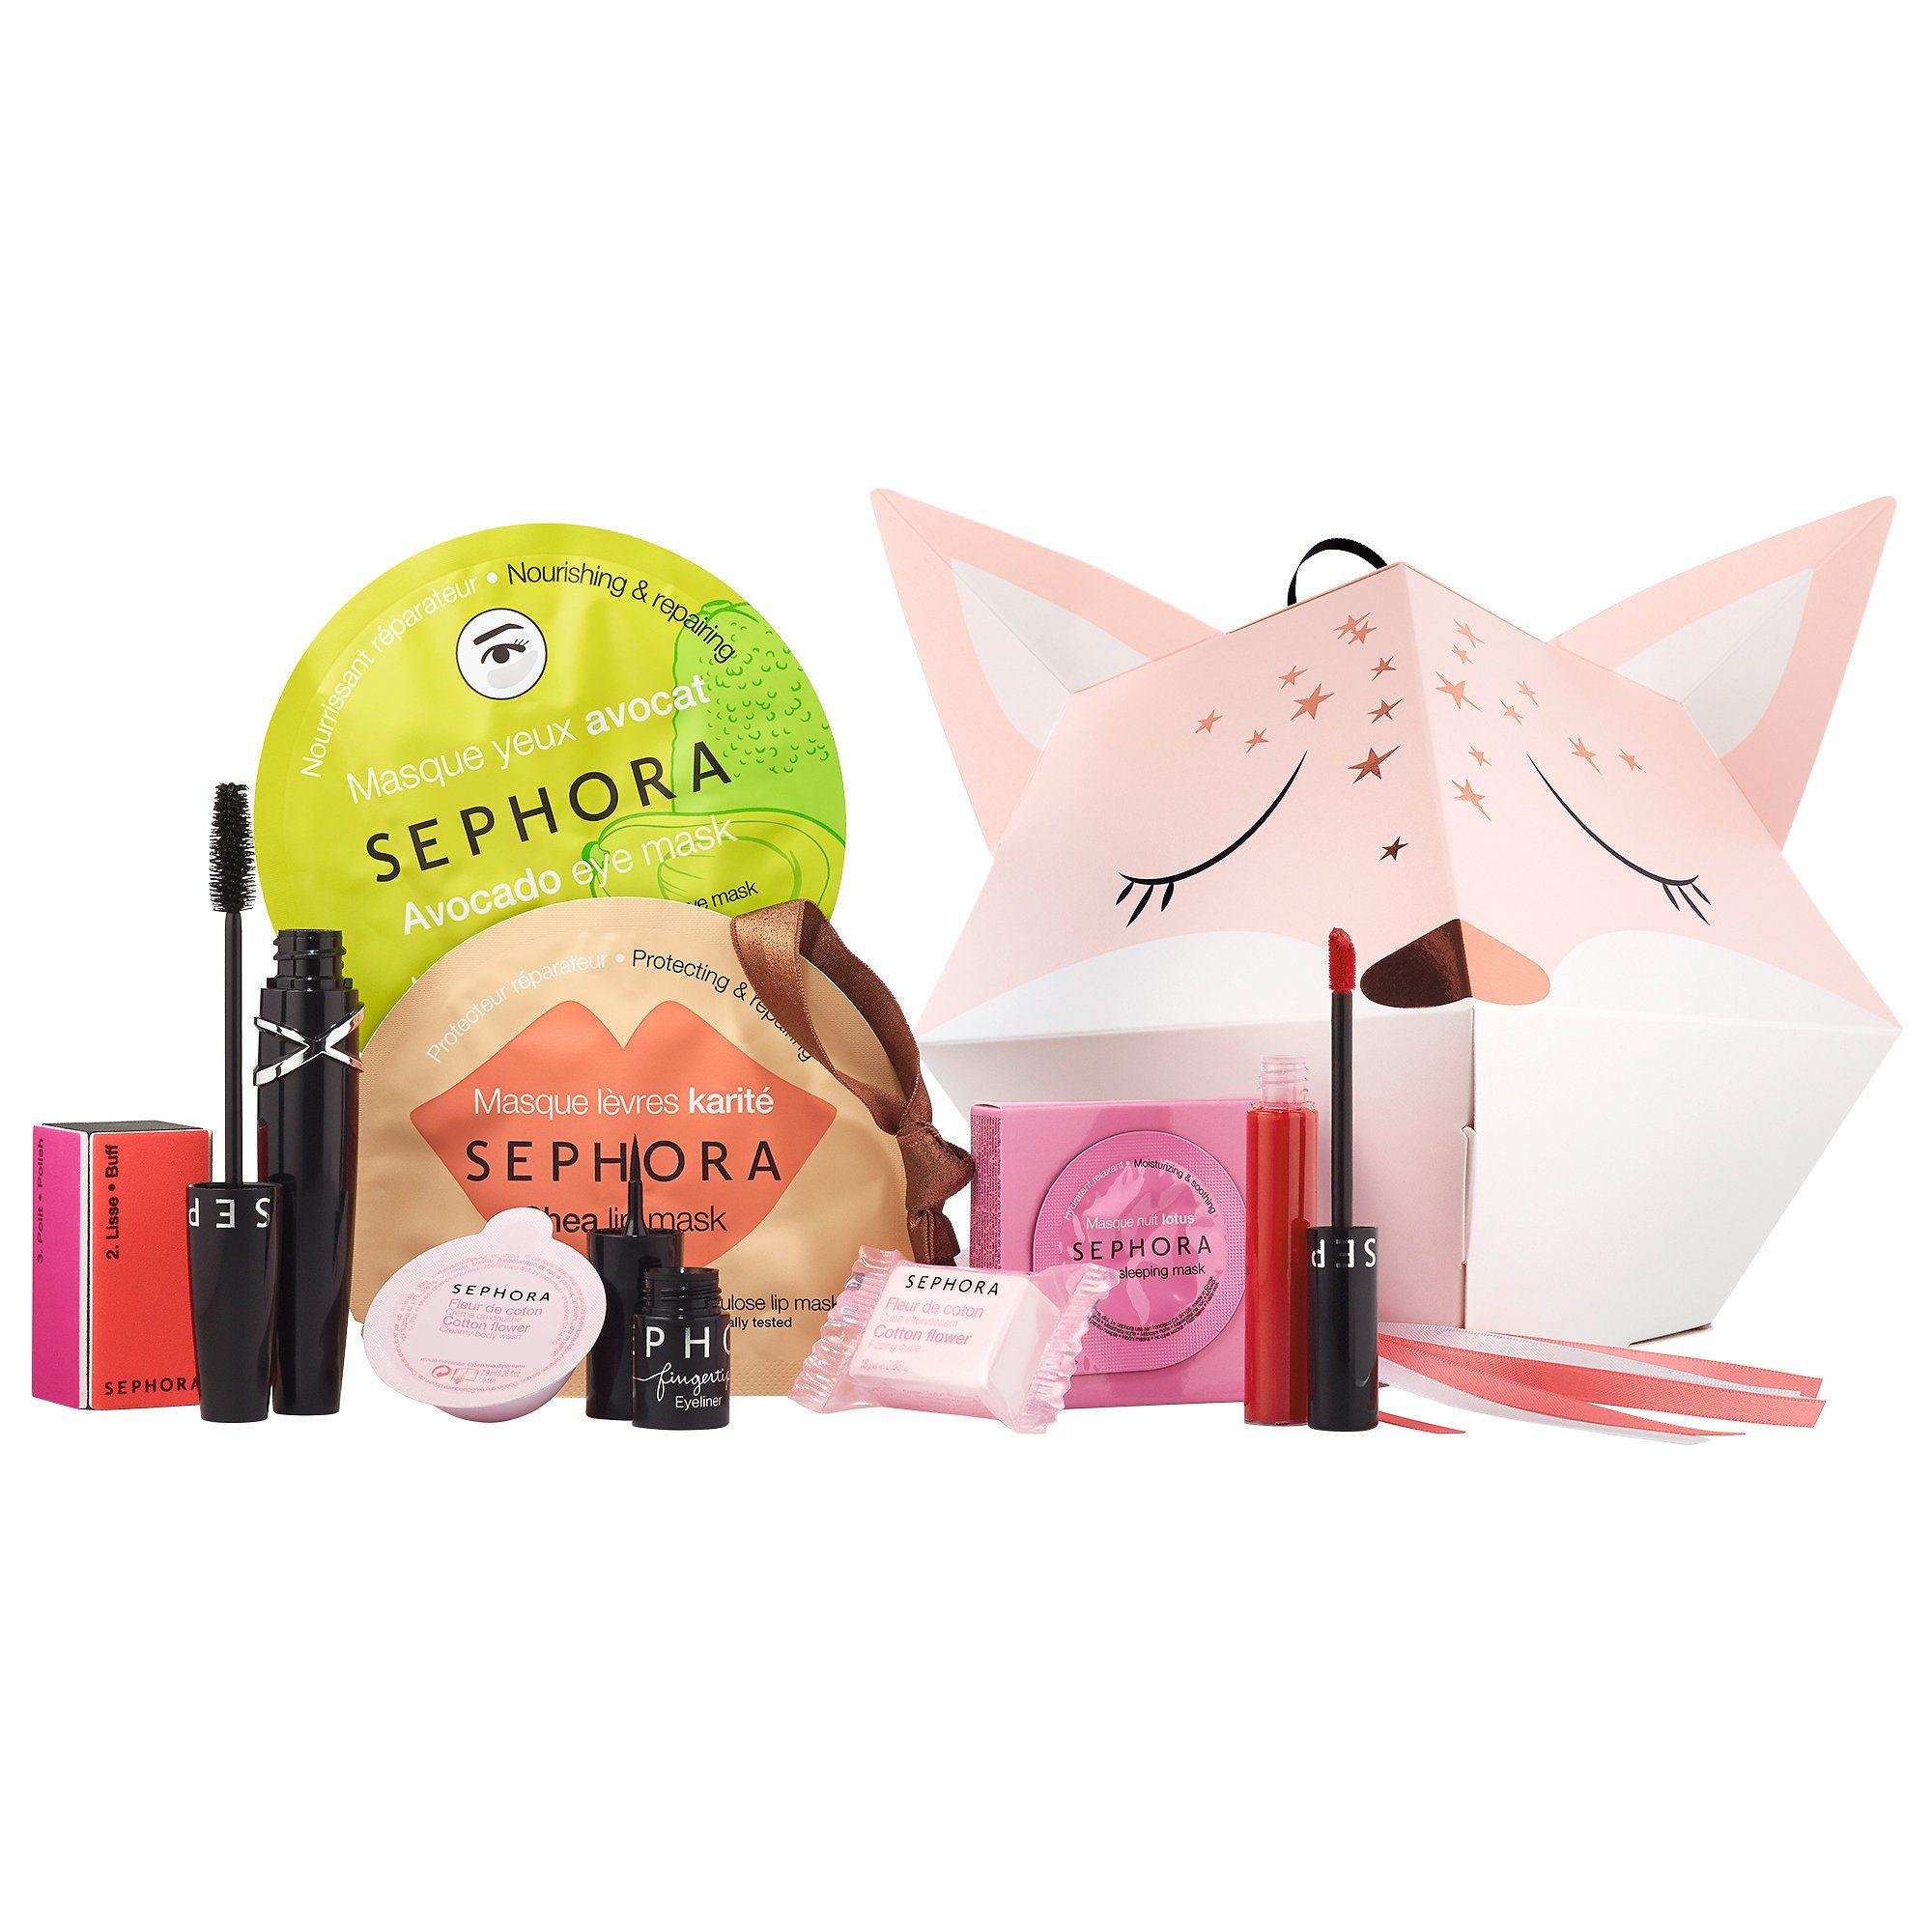 La Piñata - SEPHORA COLLECTION | Sephora | cosmetics | Pinterest